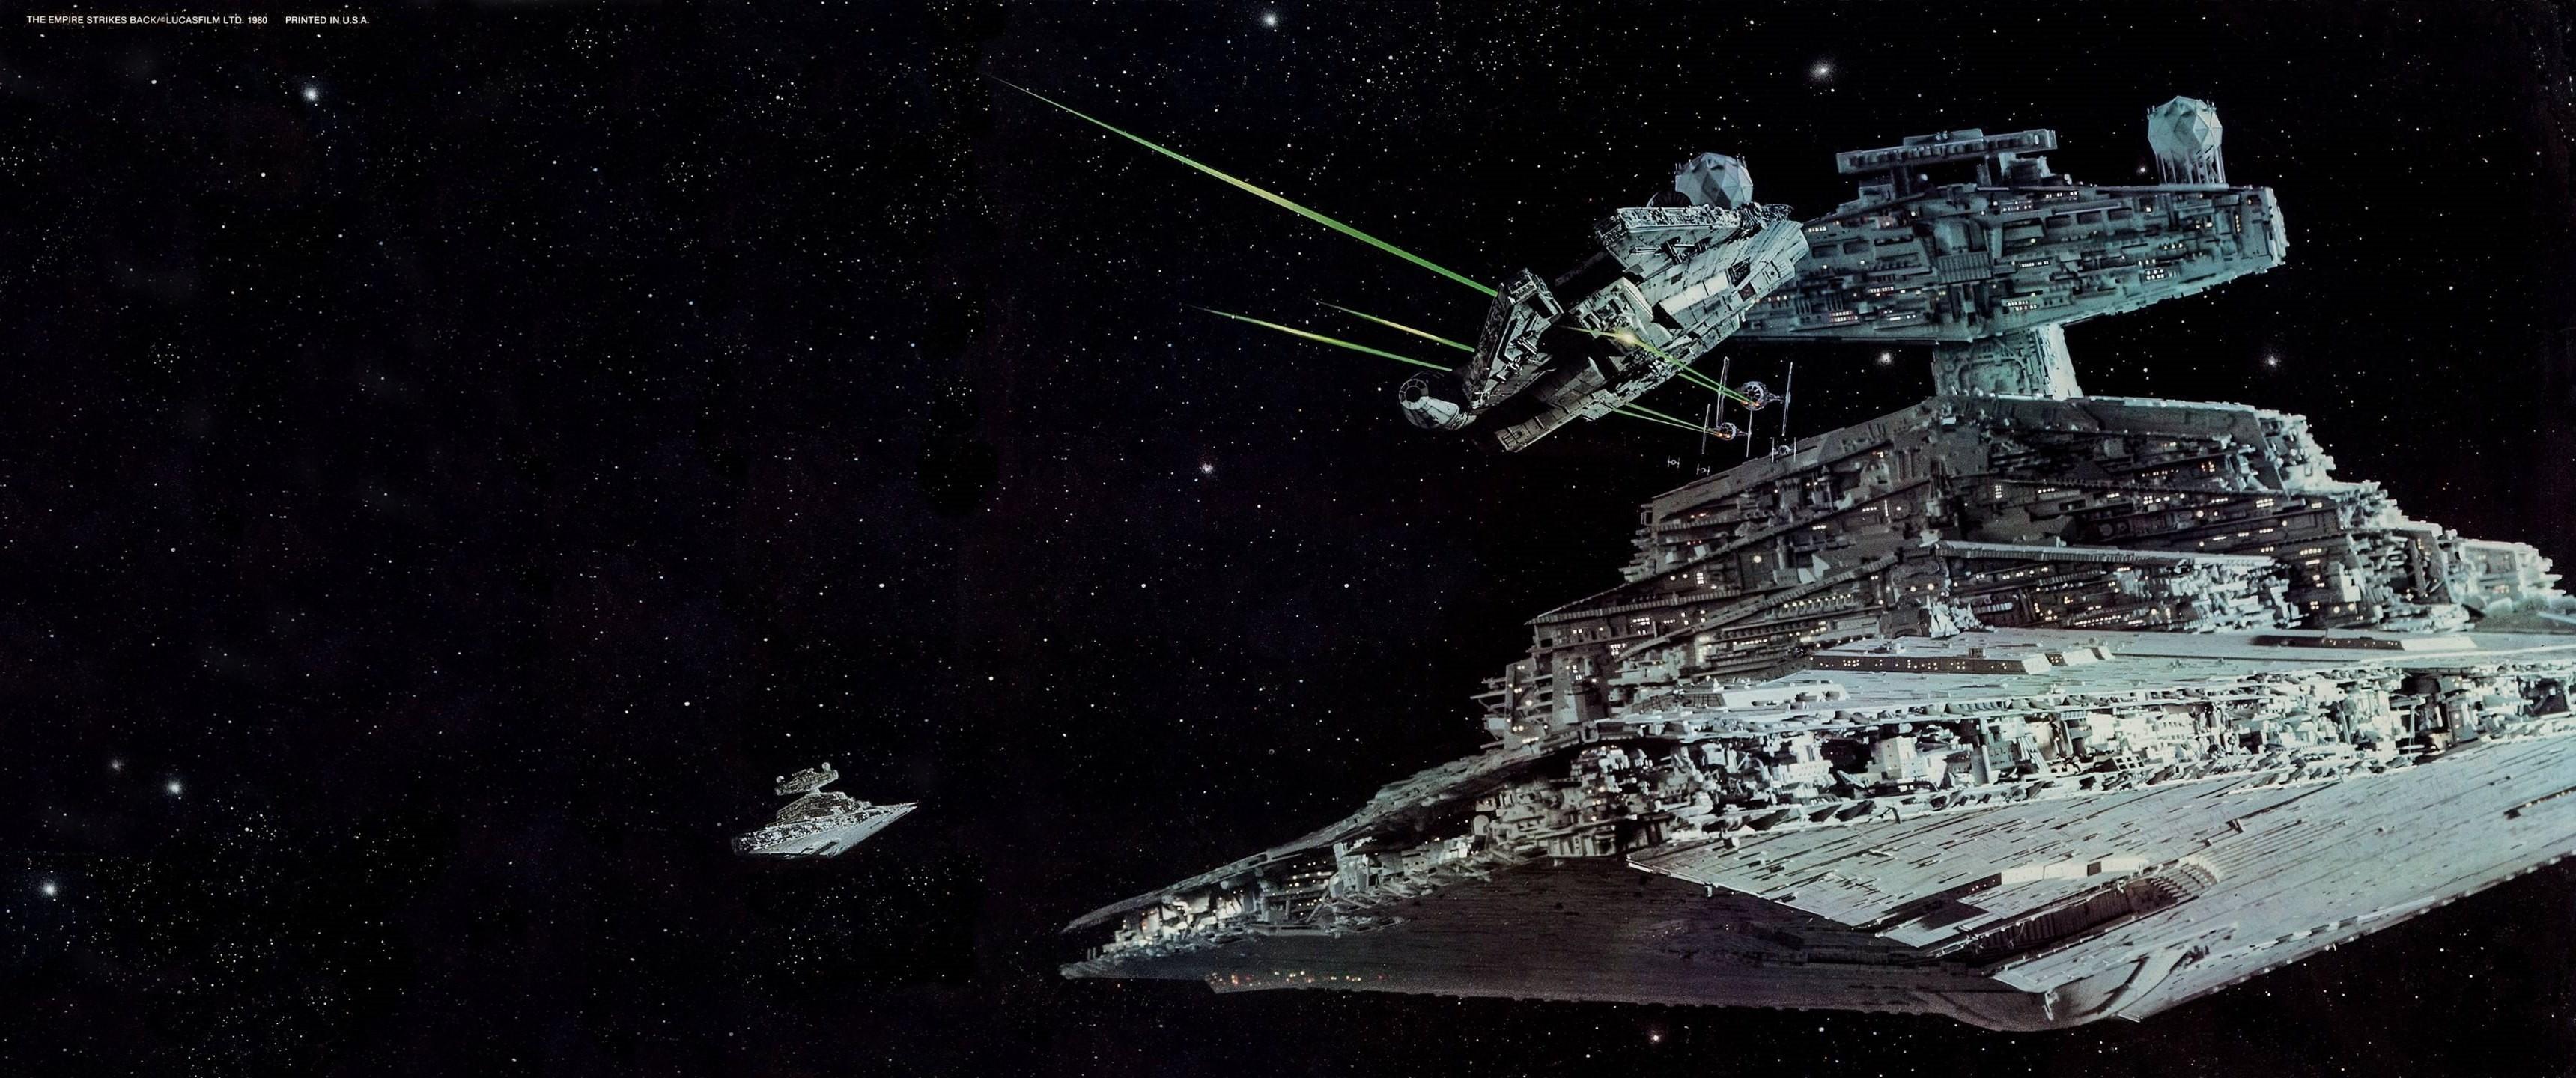 3440x1440 Wallpaper Star Wars: Star Wars Empire Strikes Back Wallpaper (71+ Images